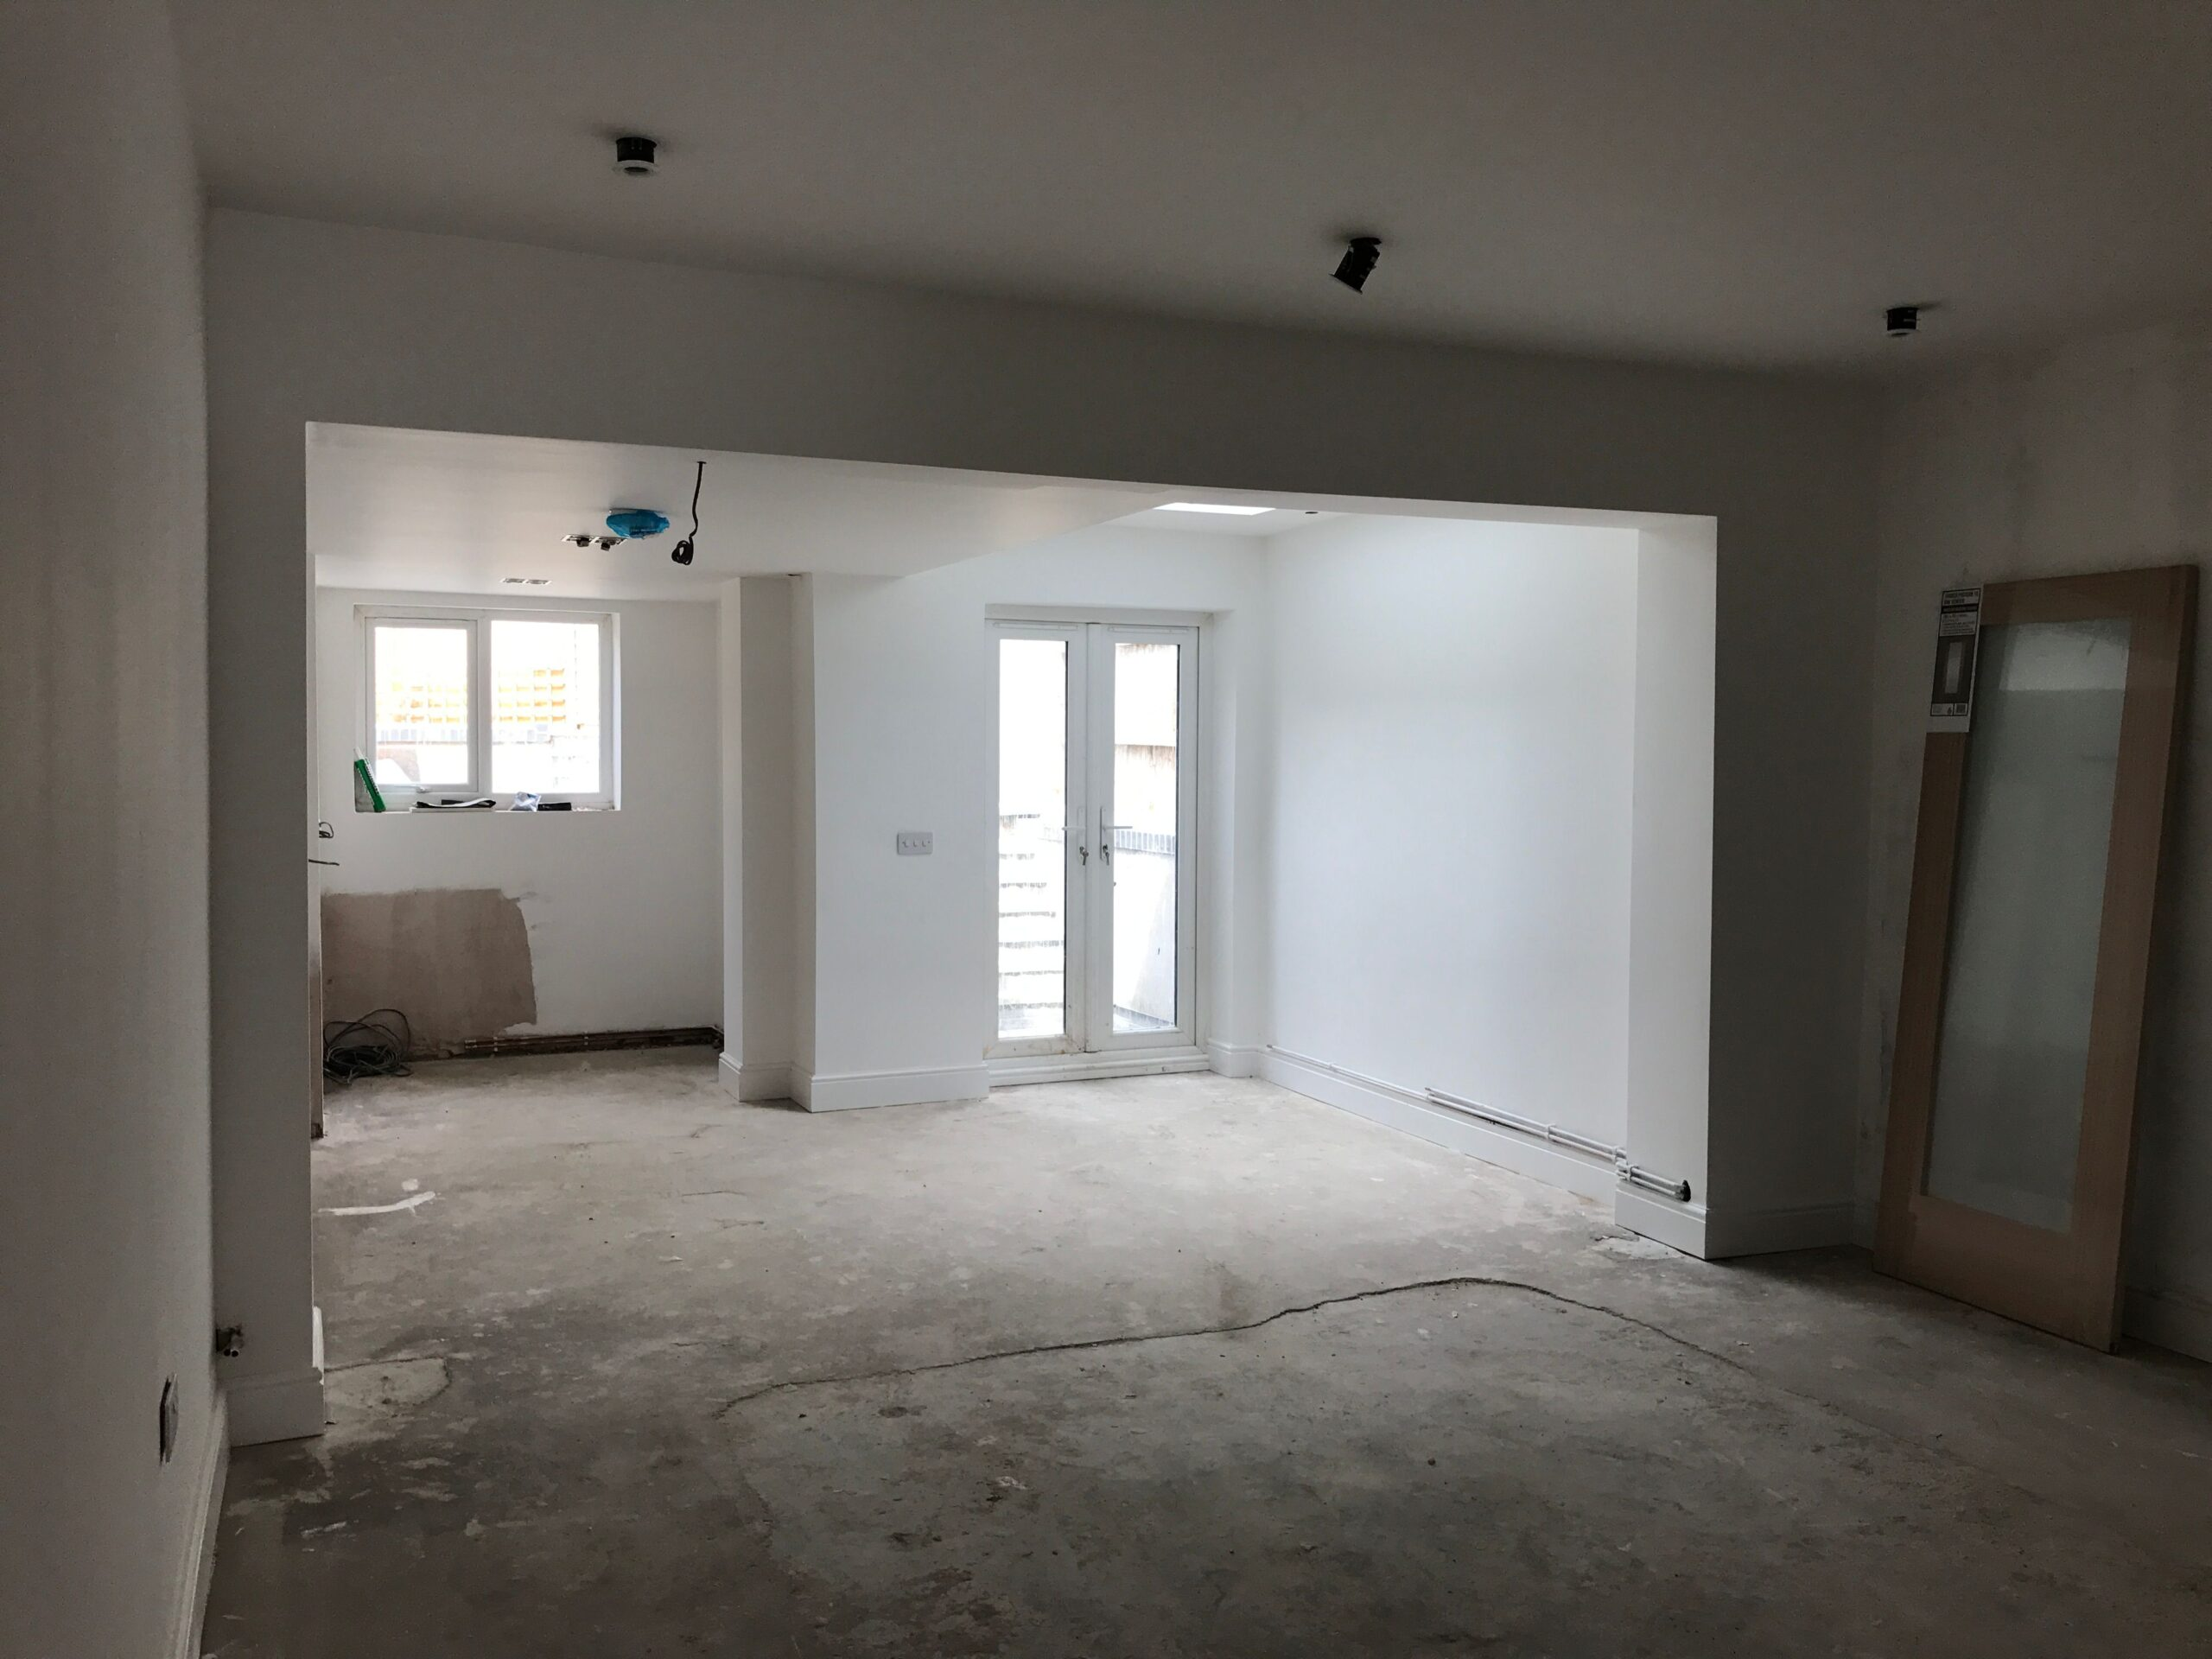 Dunkerry Road Ground Floor Kitchen Zoom Before